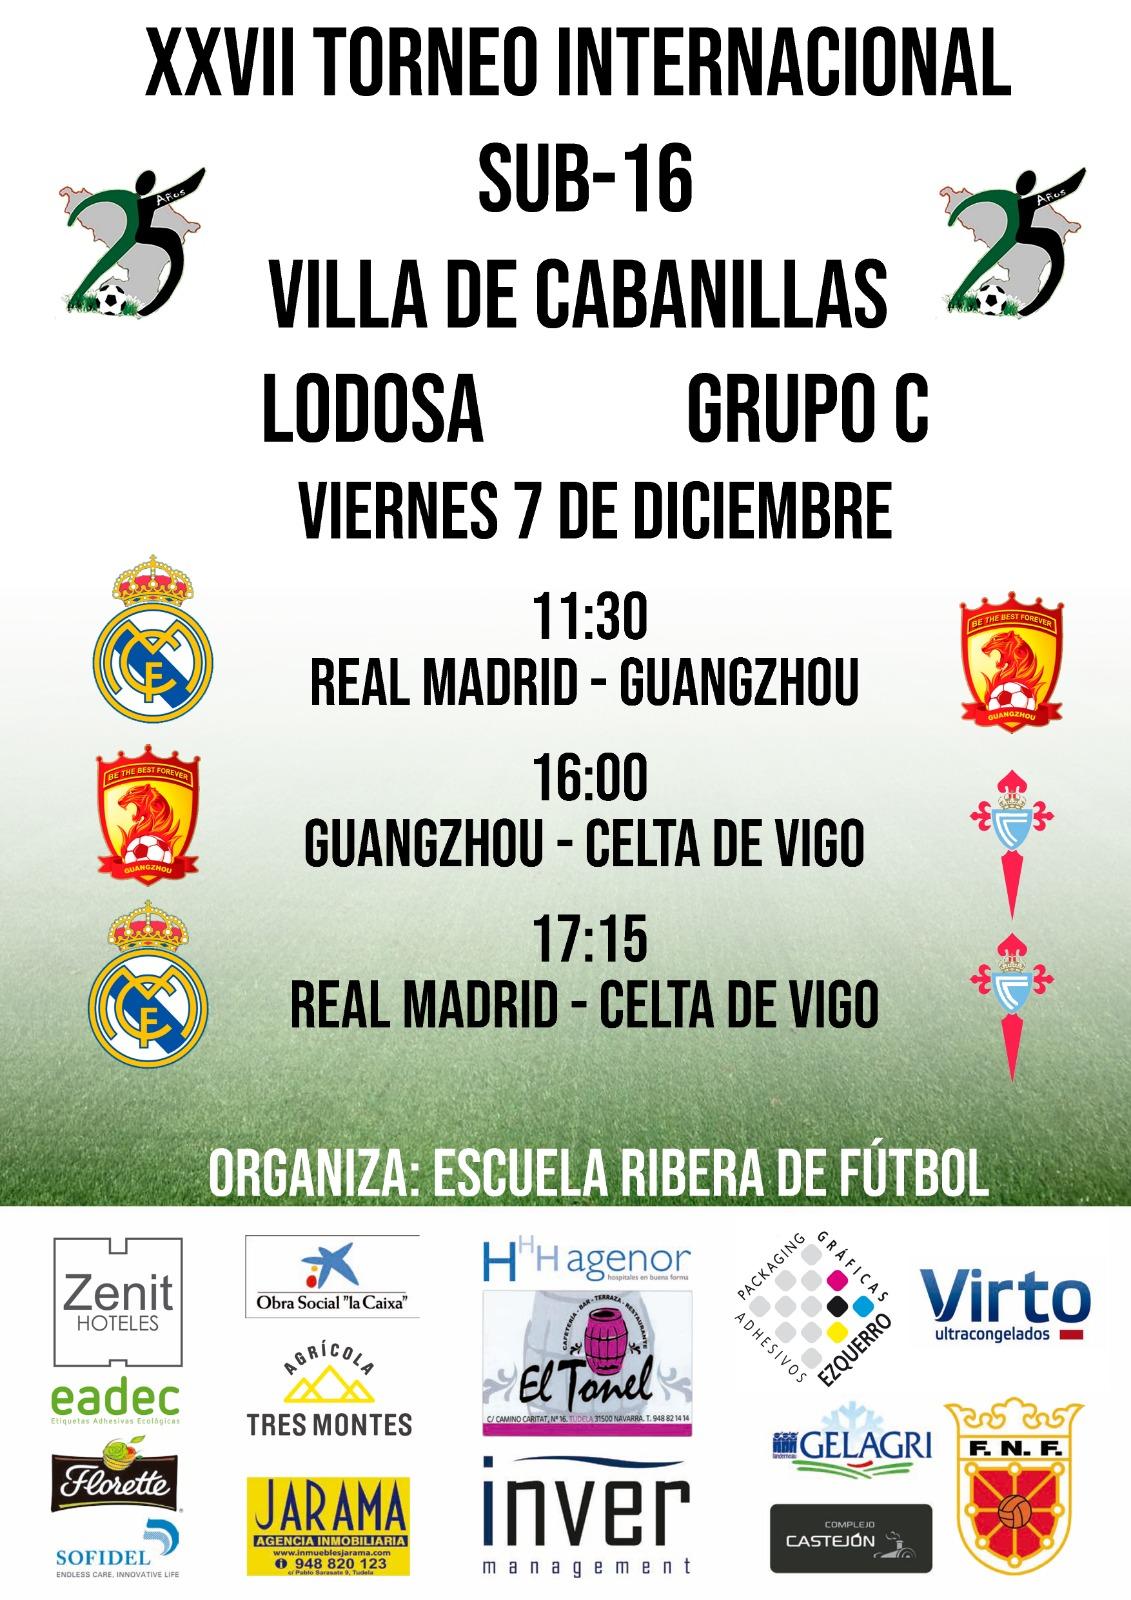 Xxvii Torneo Internacional Fútbol Sub 16 Villa De Cabanillas Grupo